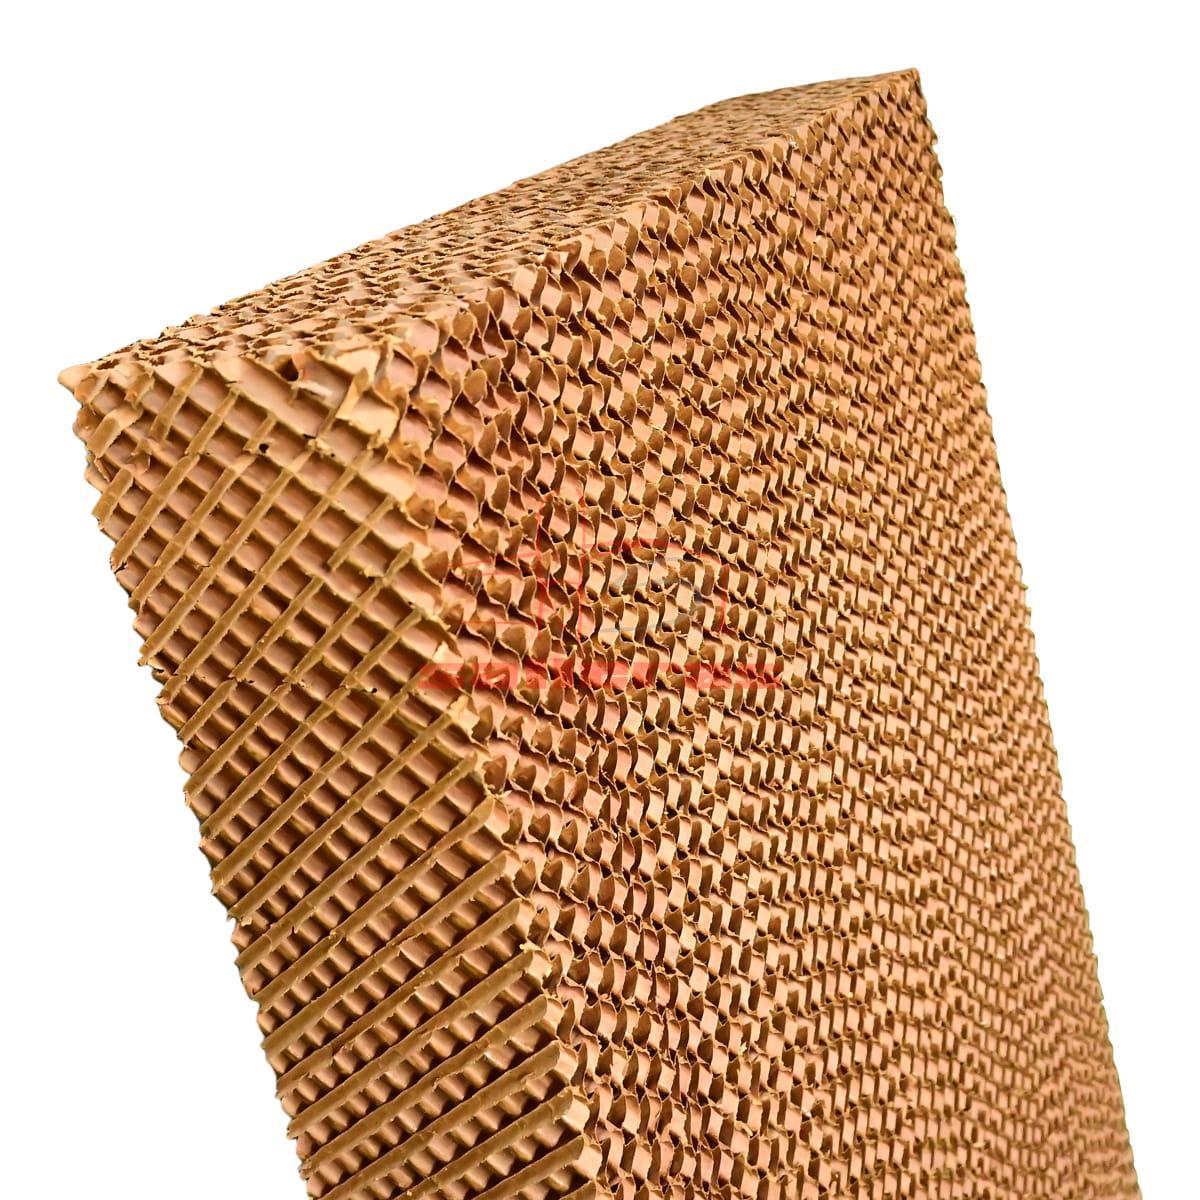 Panel de celulosa marron